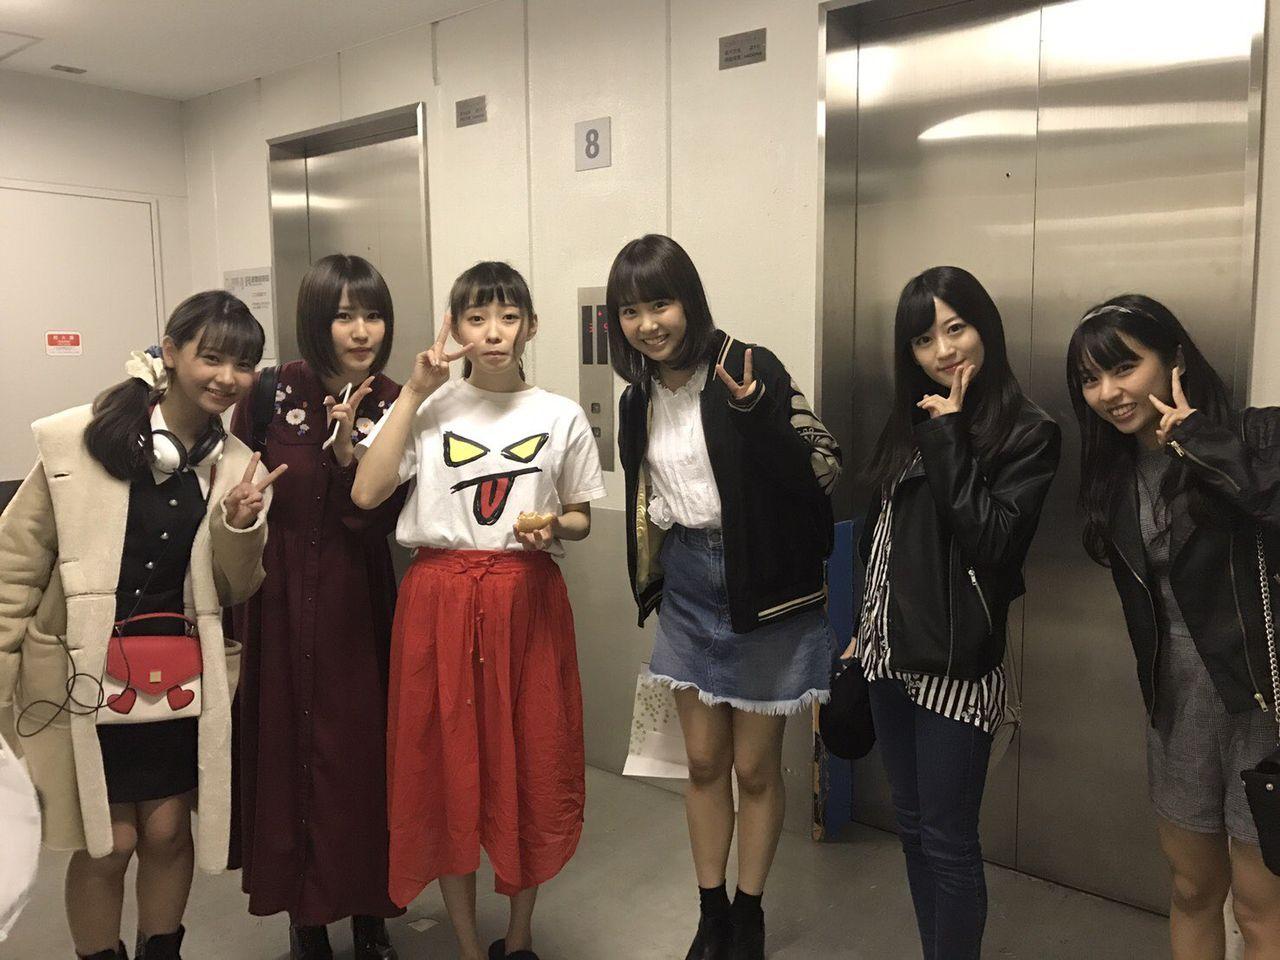 【NMB48】石塚朱莉出演中の舞台『罠々』メンバー多数観戦!